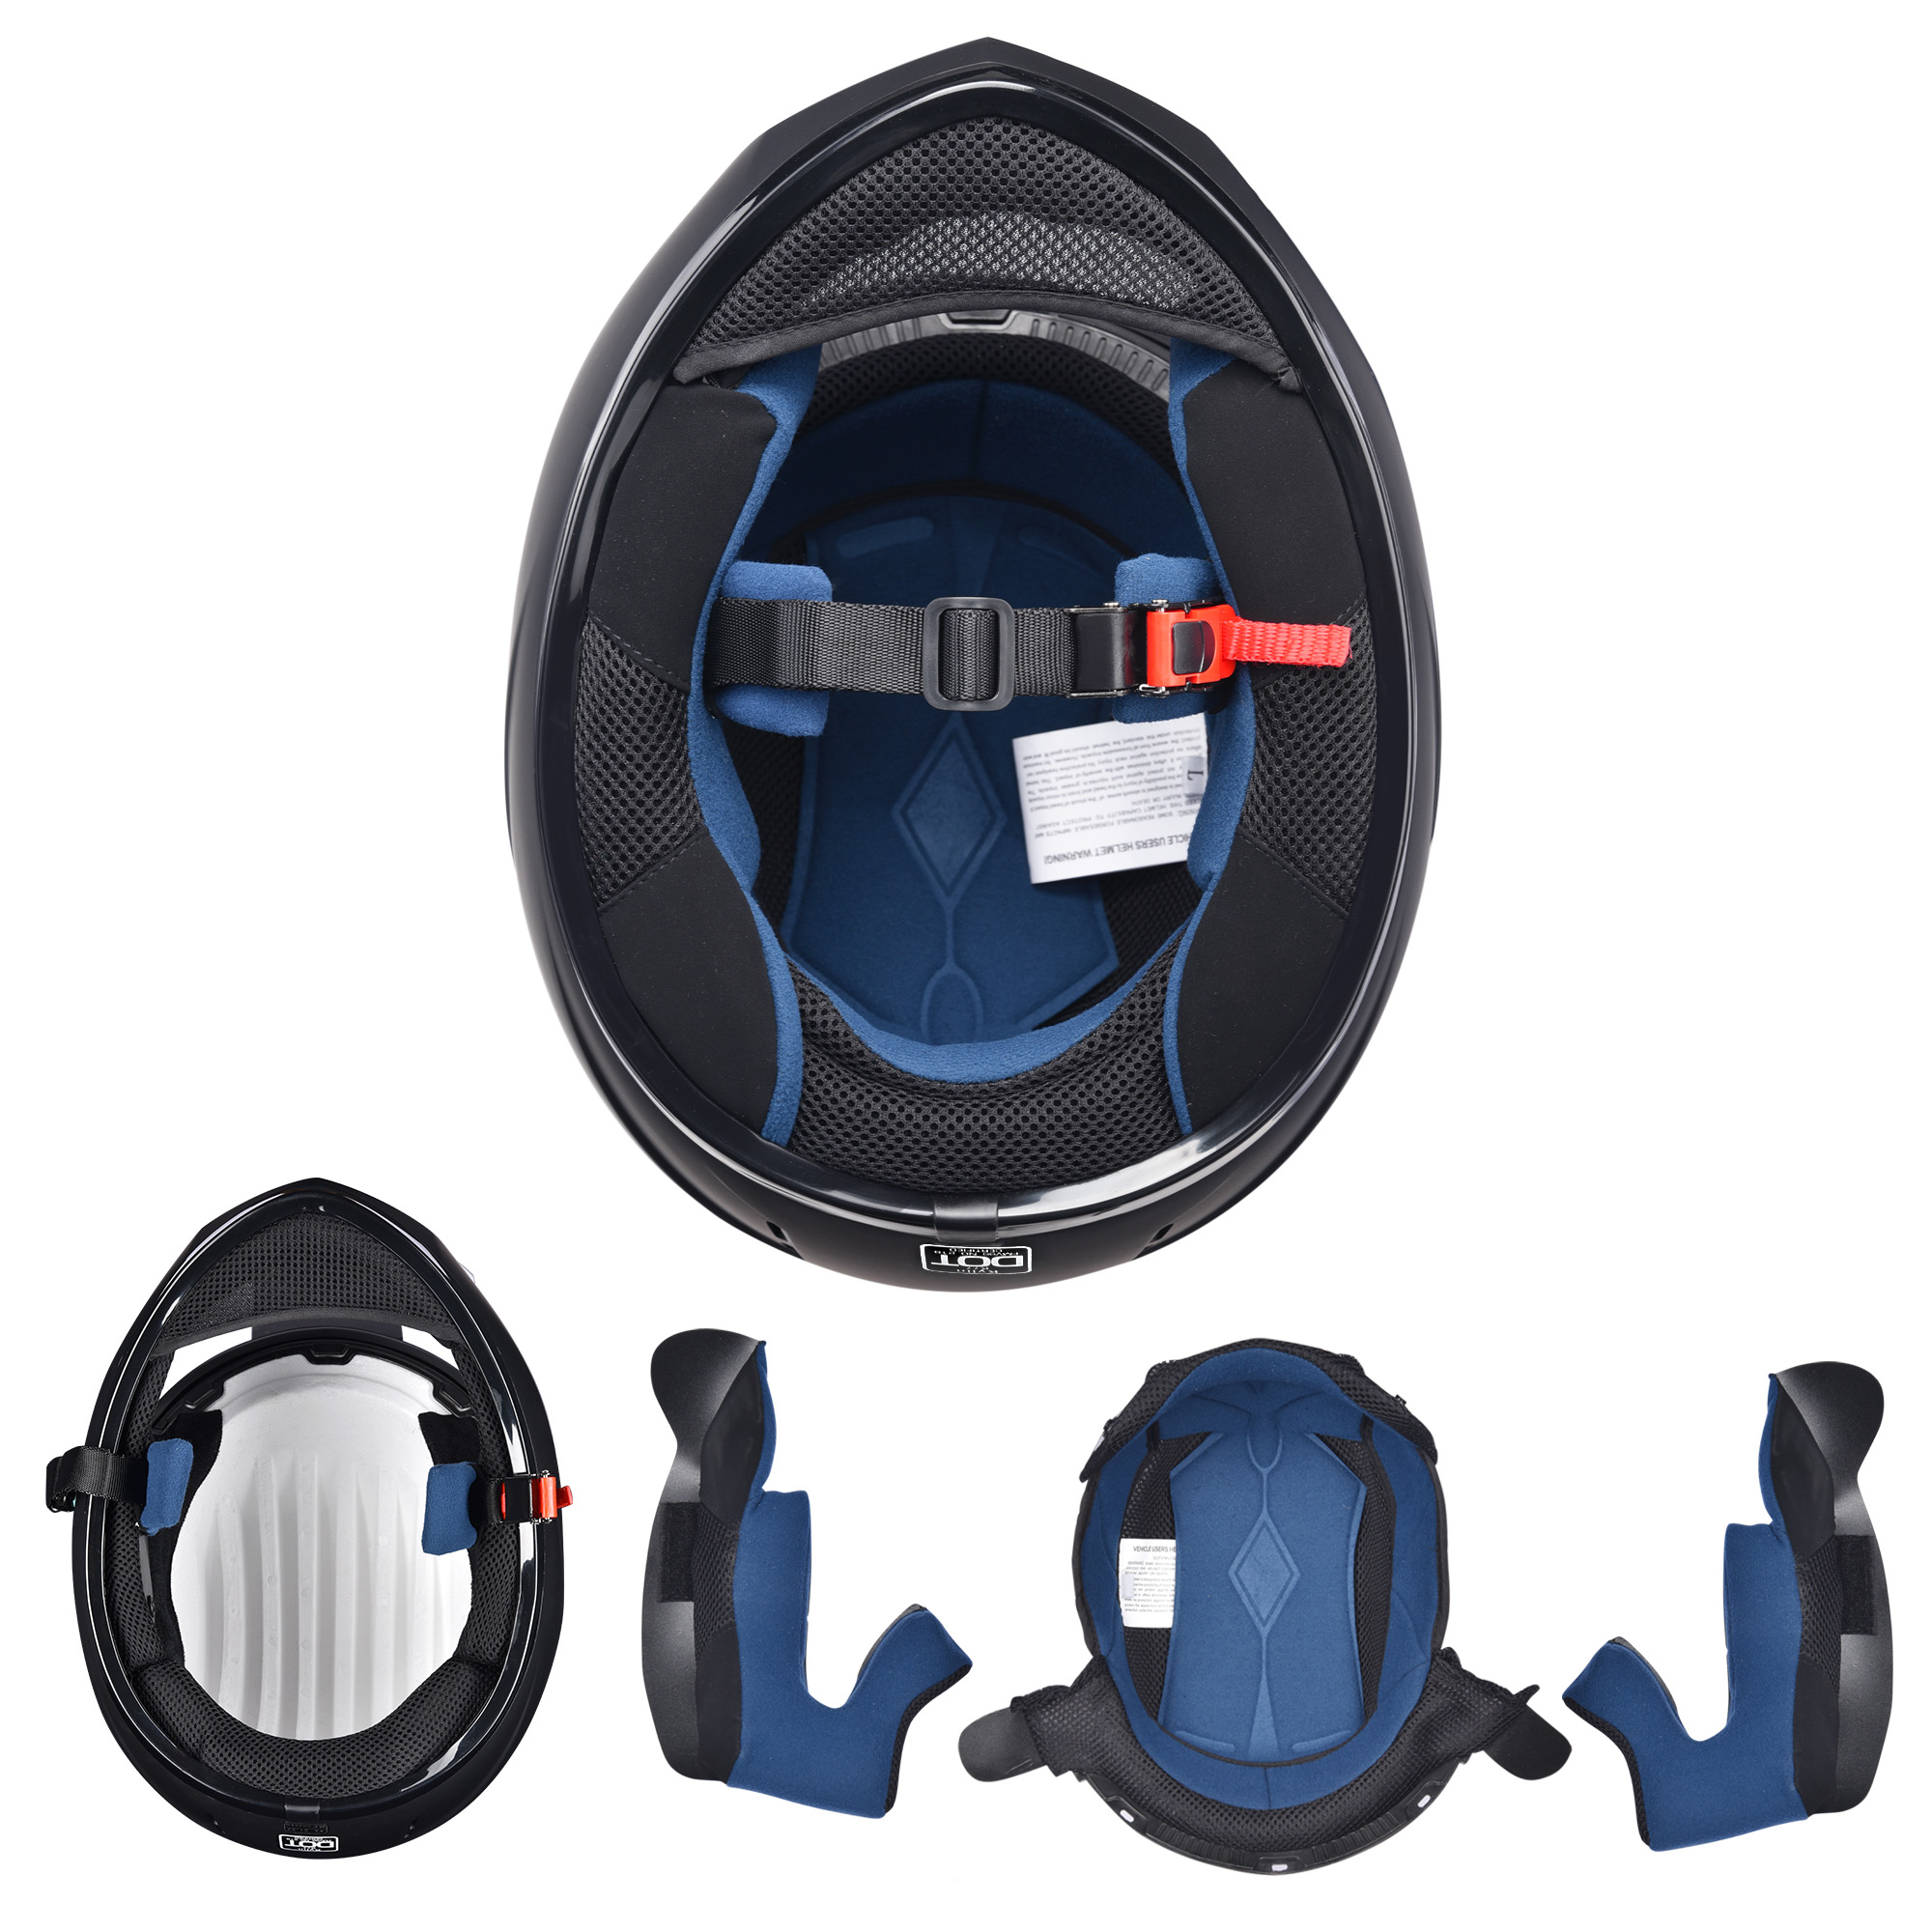 miniature 69 - AHR K12 Full Face Motorcycle Helmet DOT Air Vents Clear Visor Racing S M L XL